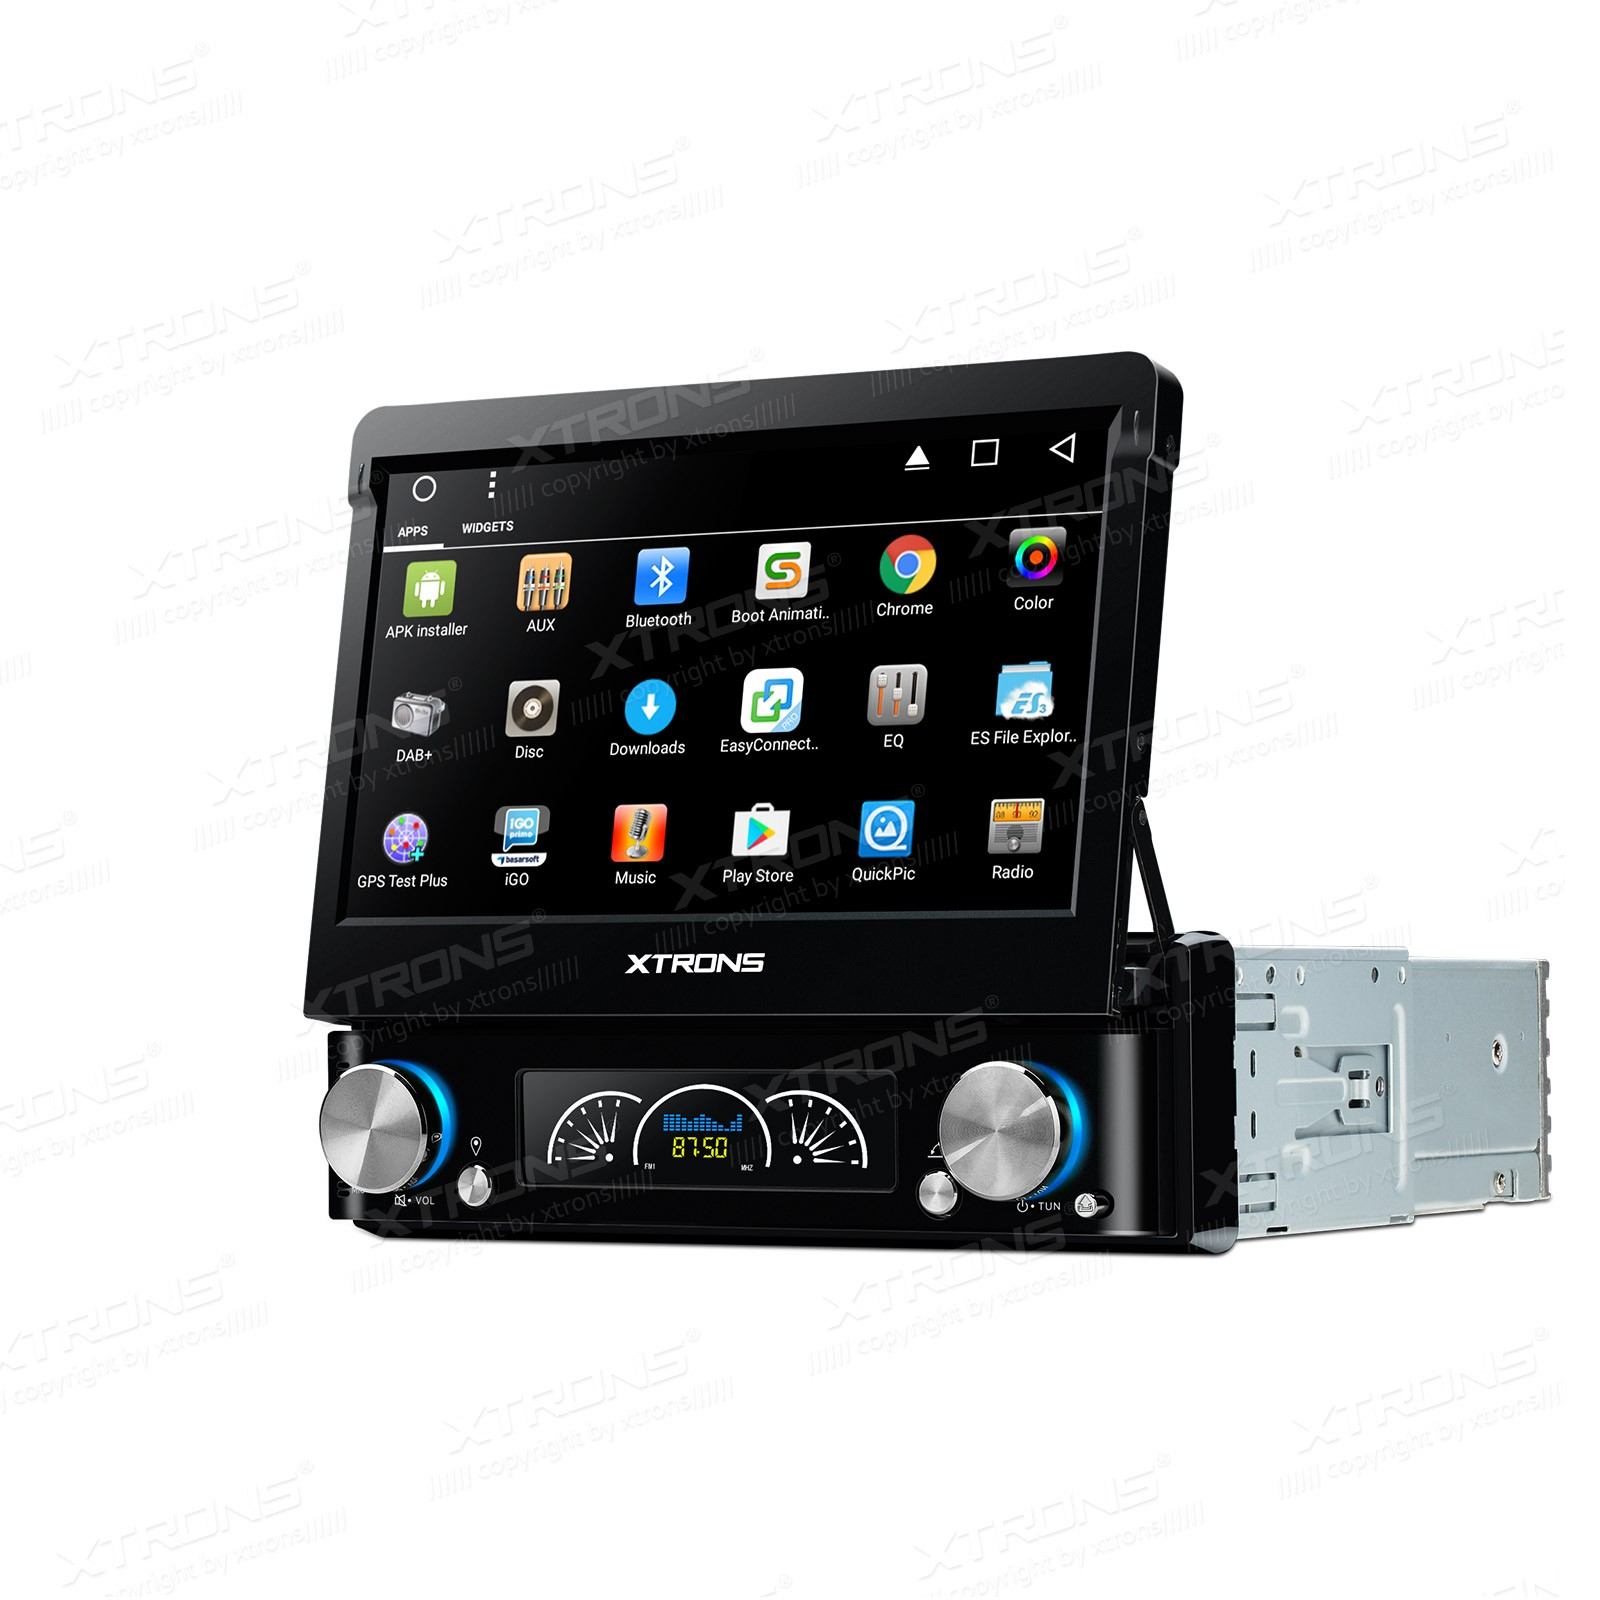 0 Xtrons Universal 1 DIN Android DVD spiller med GPS og DAB+